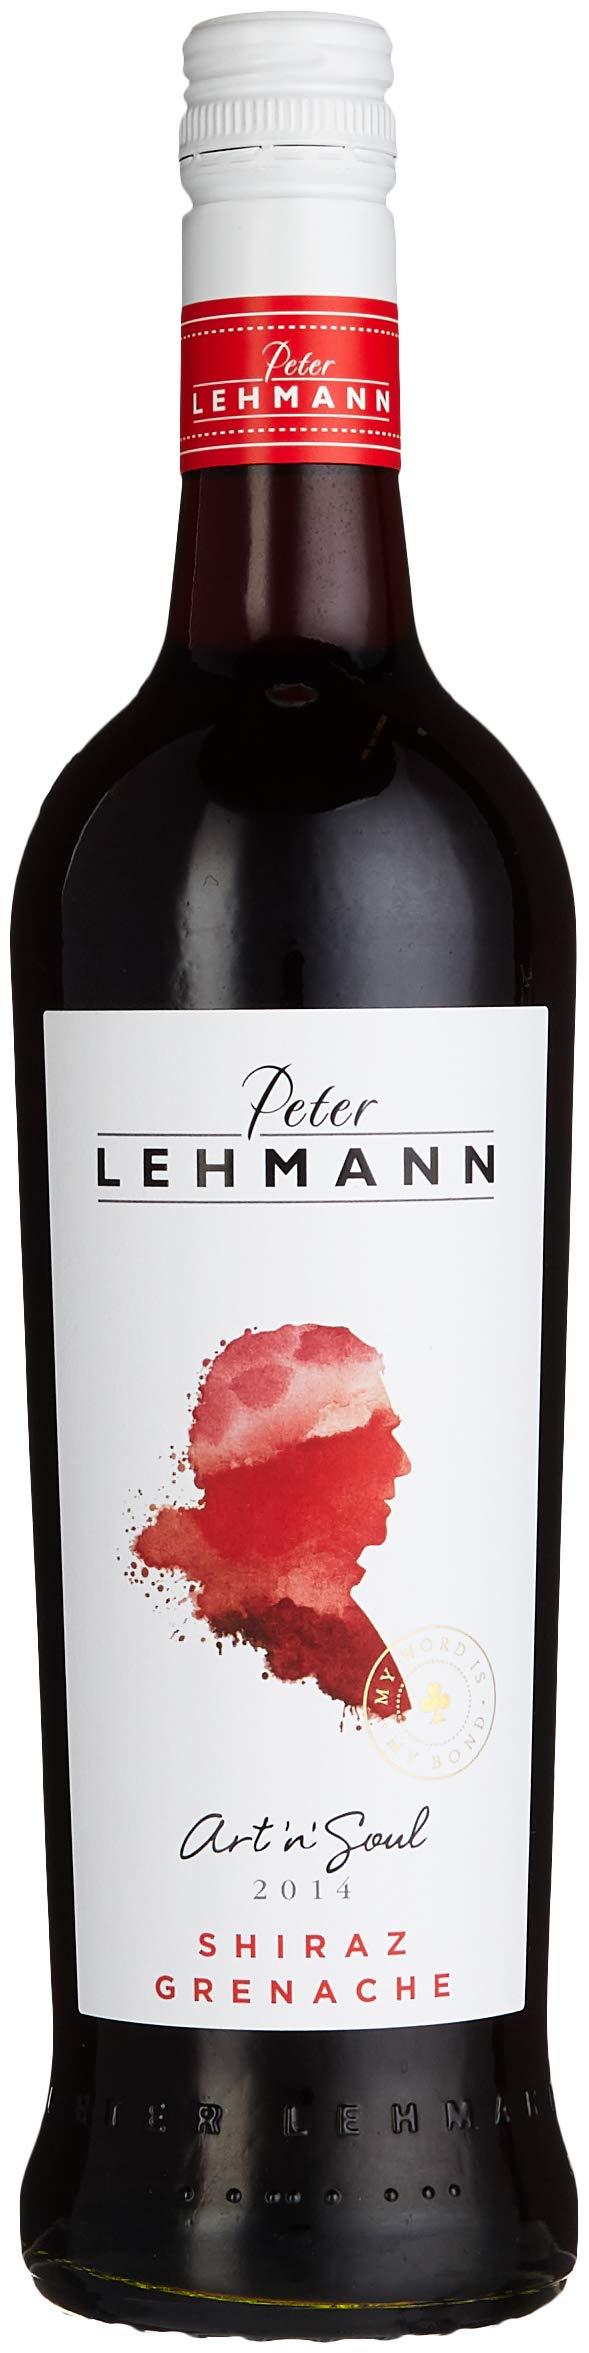 Peter-Lehmann-Shiraz-Grenache-Barossa-Valley-20132014-trocken-6-x-075-l